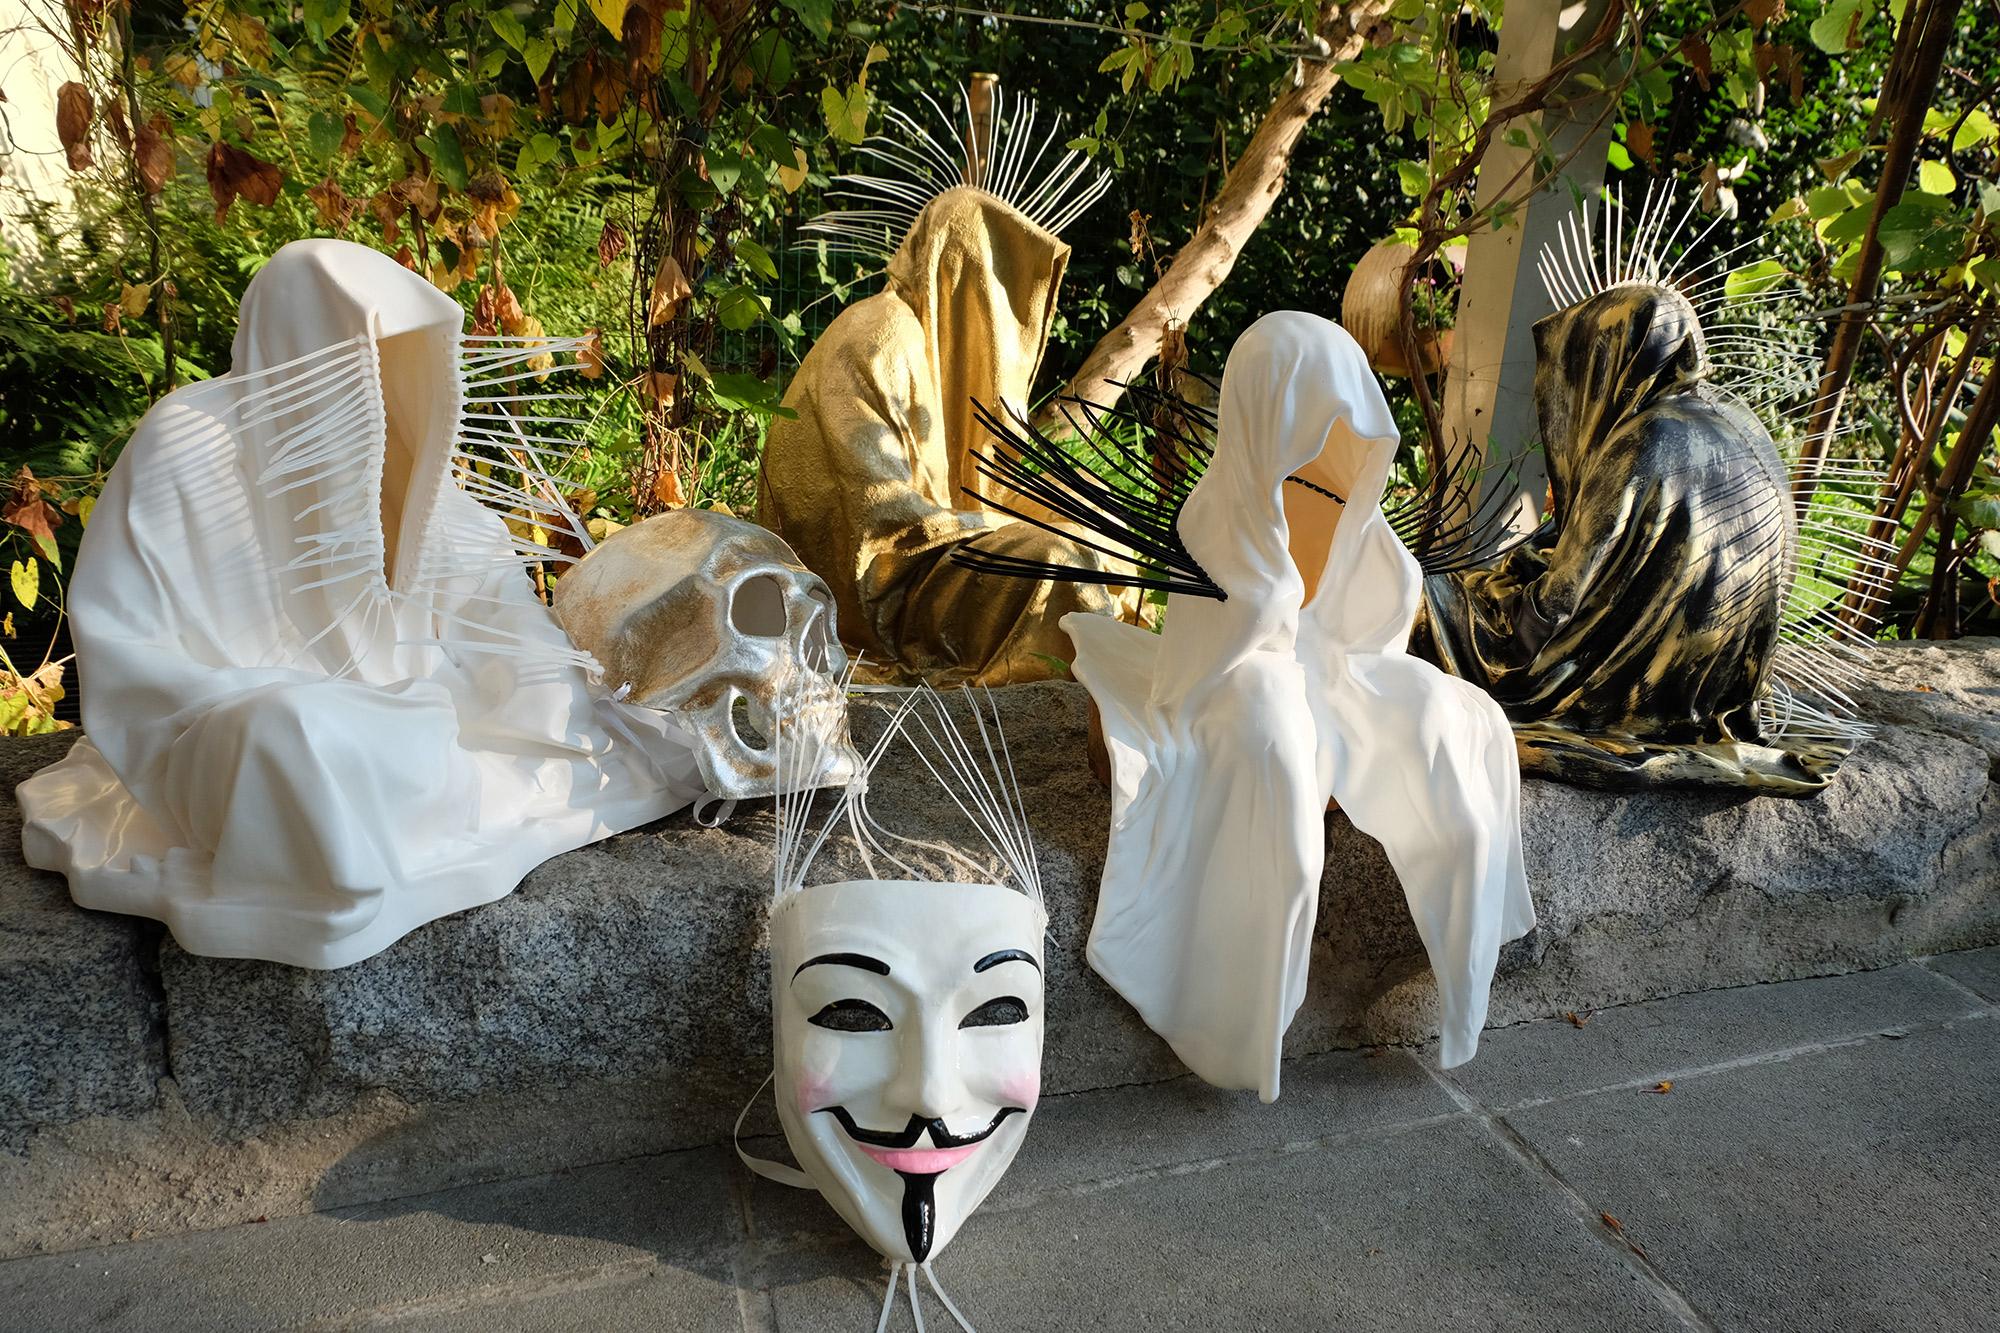 #faceless-#mask-#cableties-#ziptie-ty-#guardiansoftime-#manfredkielnhofer-#contemporaryart-#arts-#design-#sculpture-#statue-#museum-#gallery-#fineart-#lightart-#ghost-#anonymous-8129